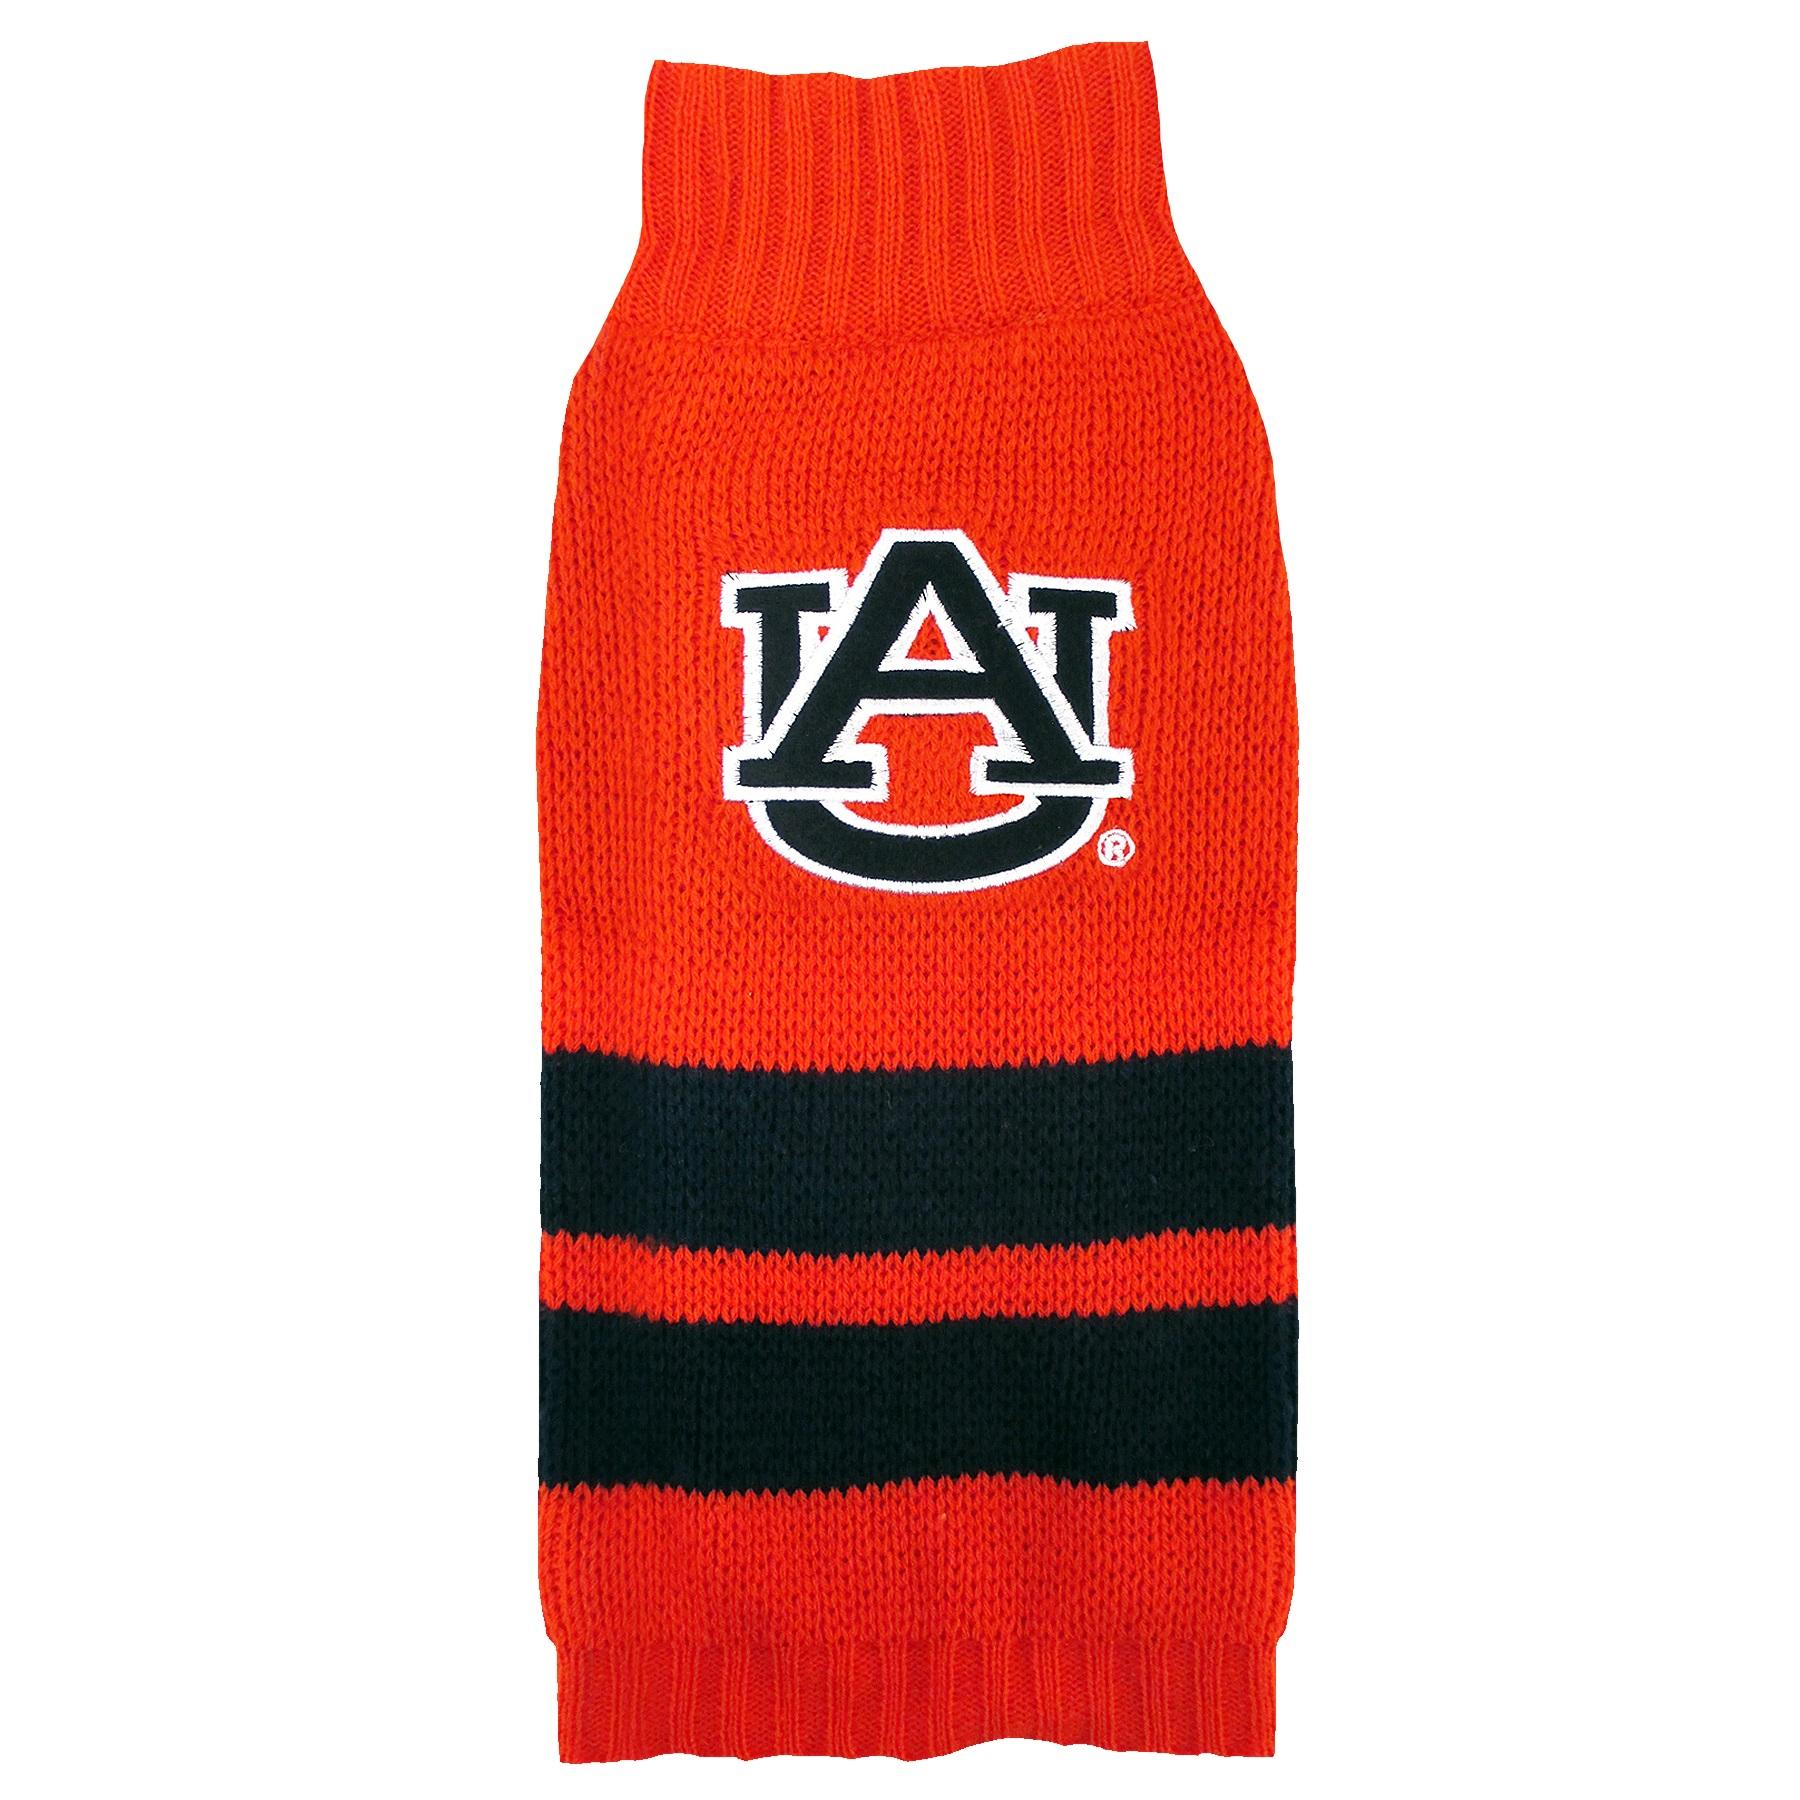 Auburn University Knitted Turtleneck Pet Sweater